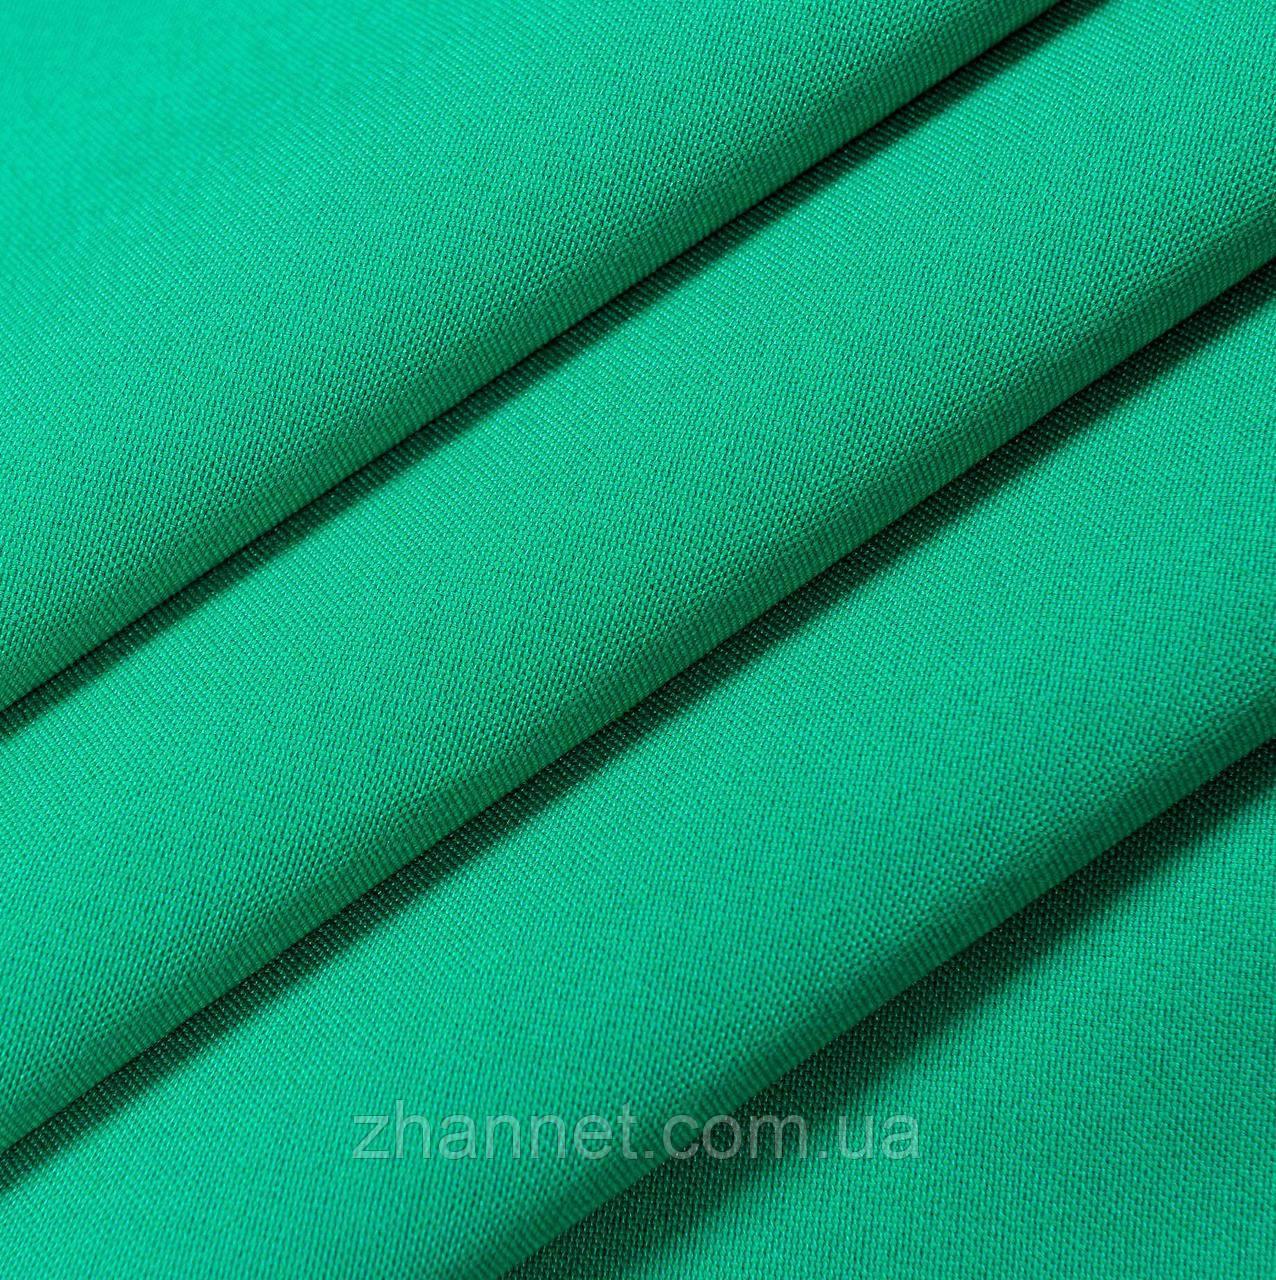 Ткань для штор Kanzas ярко-зеленый